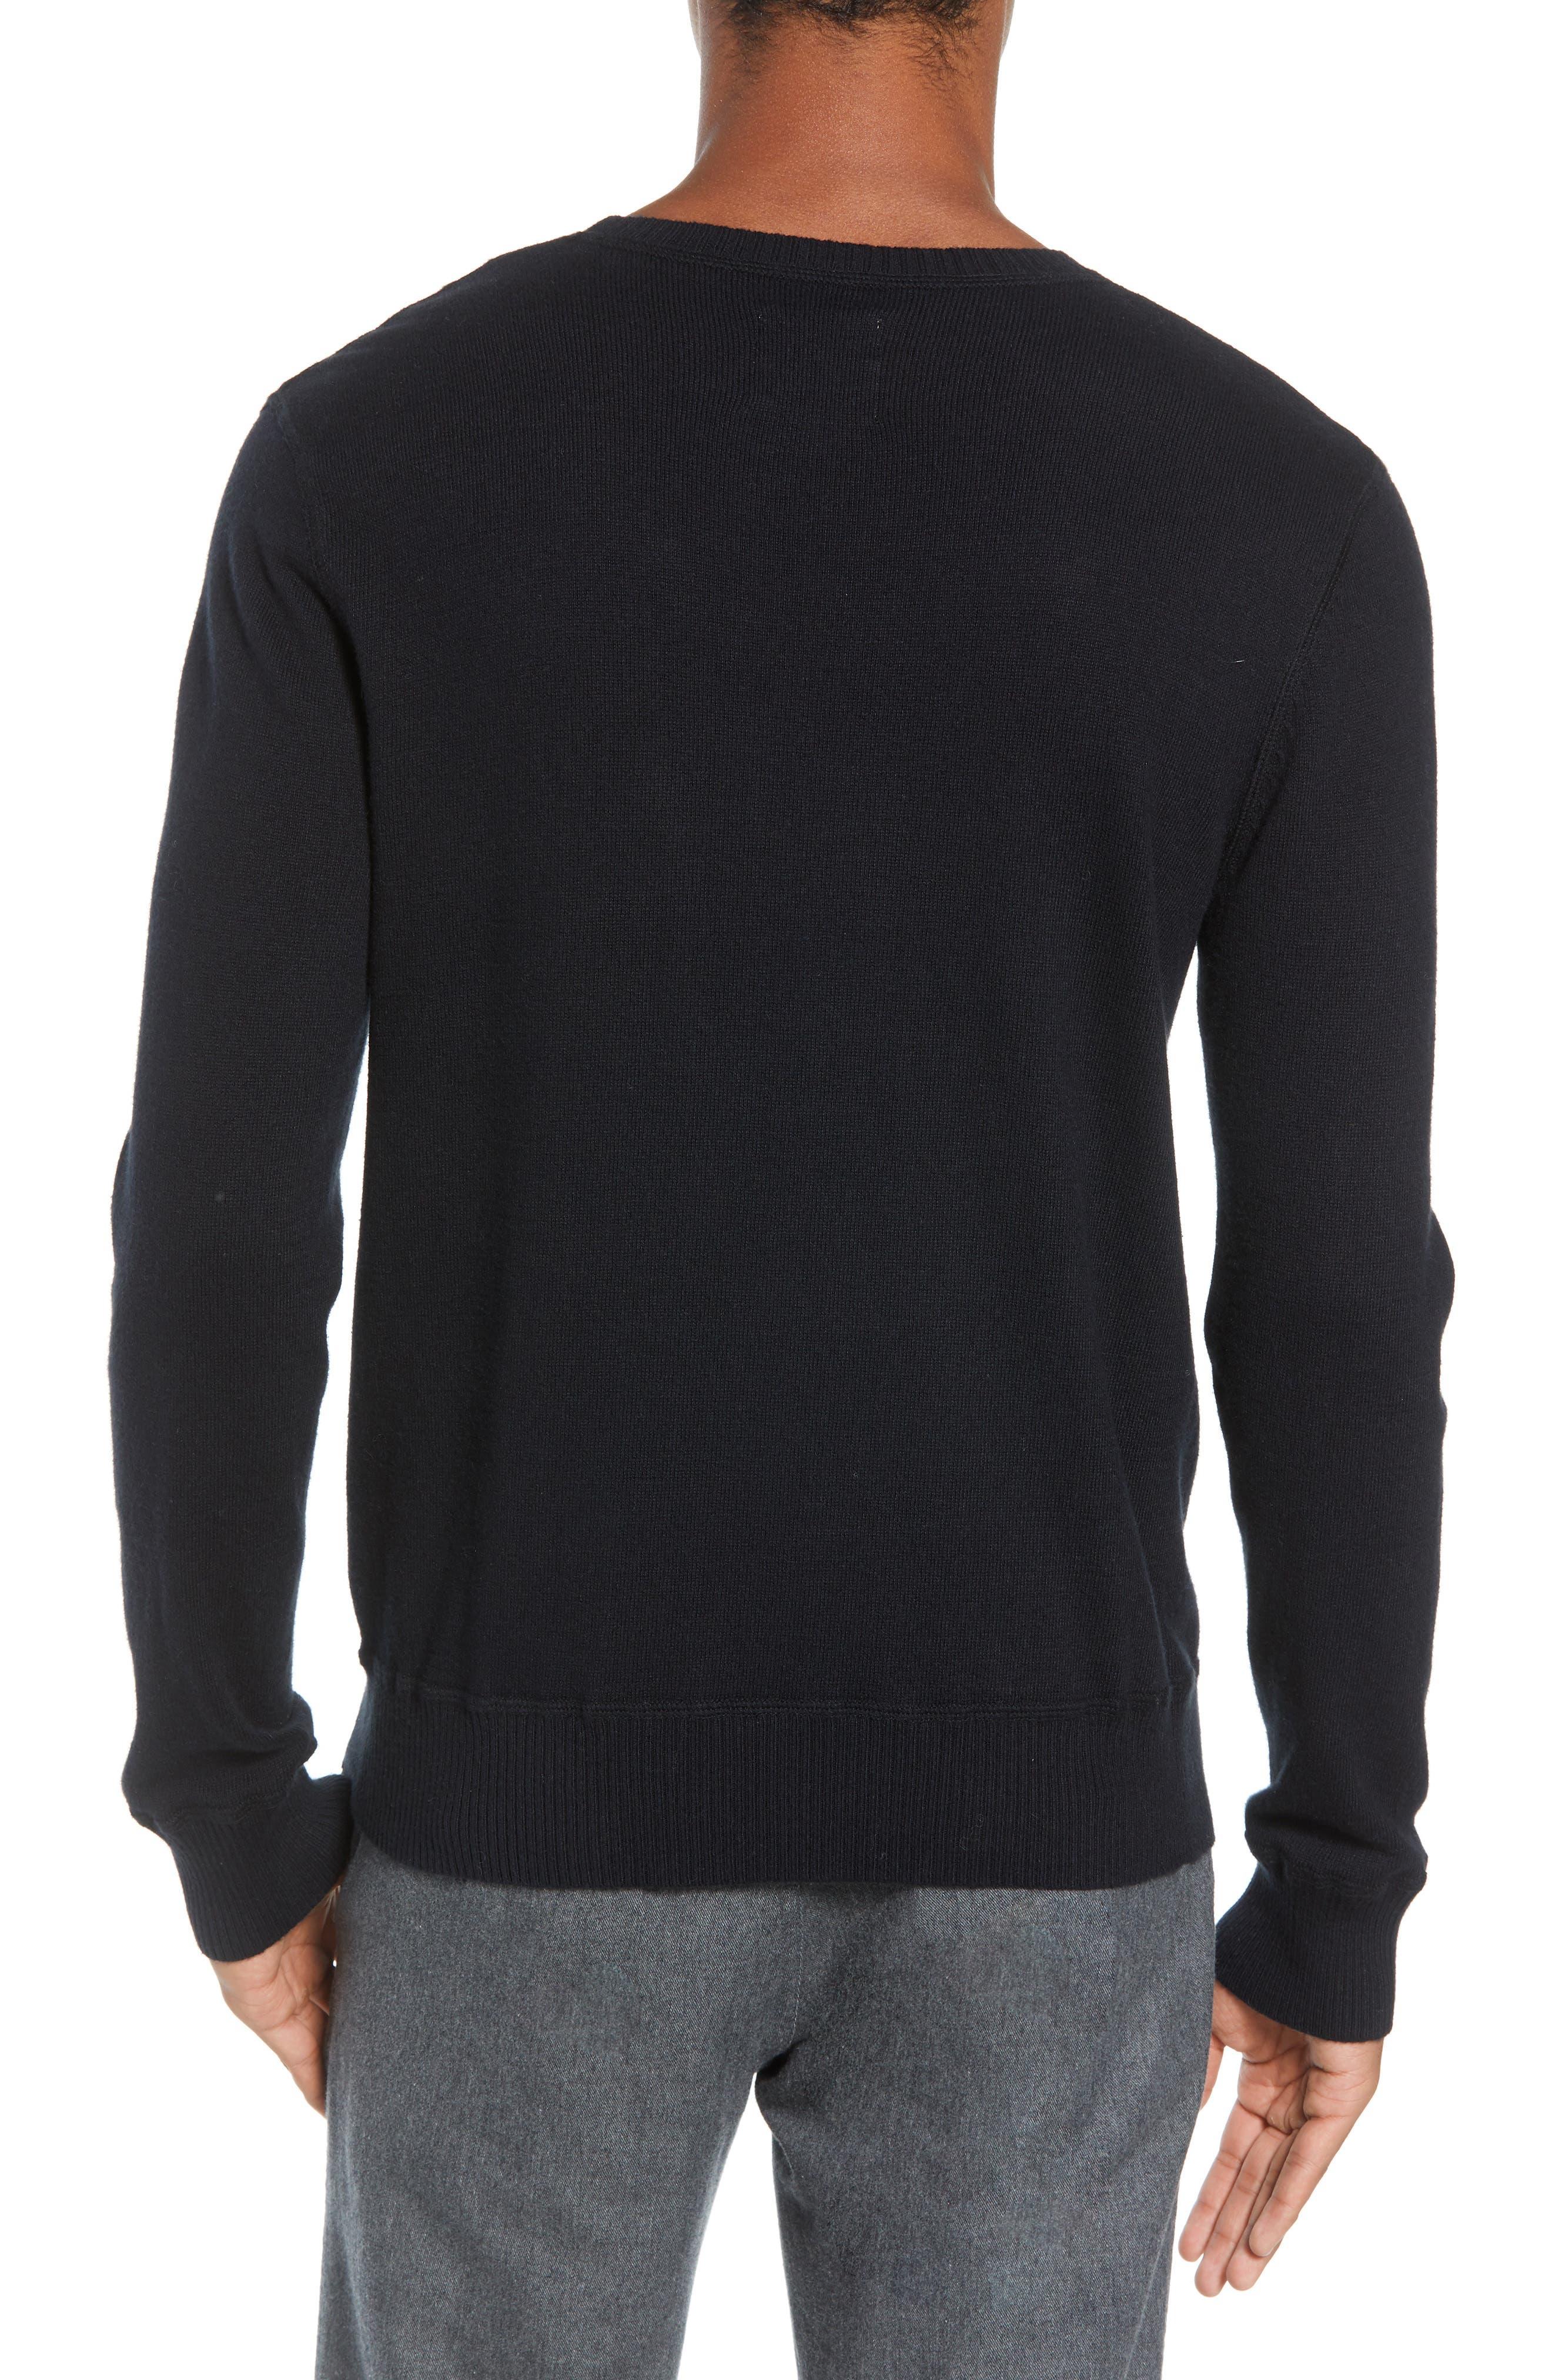 Tournament Slim Fit Crewneck Sweater,                             Alternate thumbnail 2, color,                             BLACK